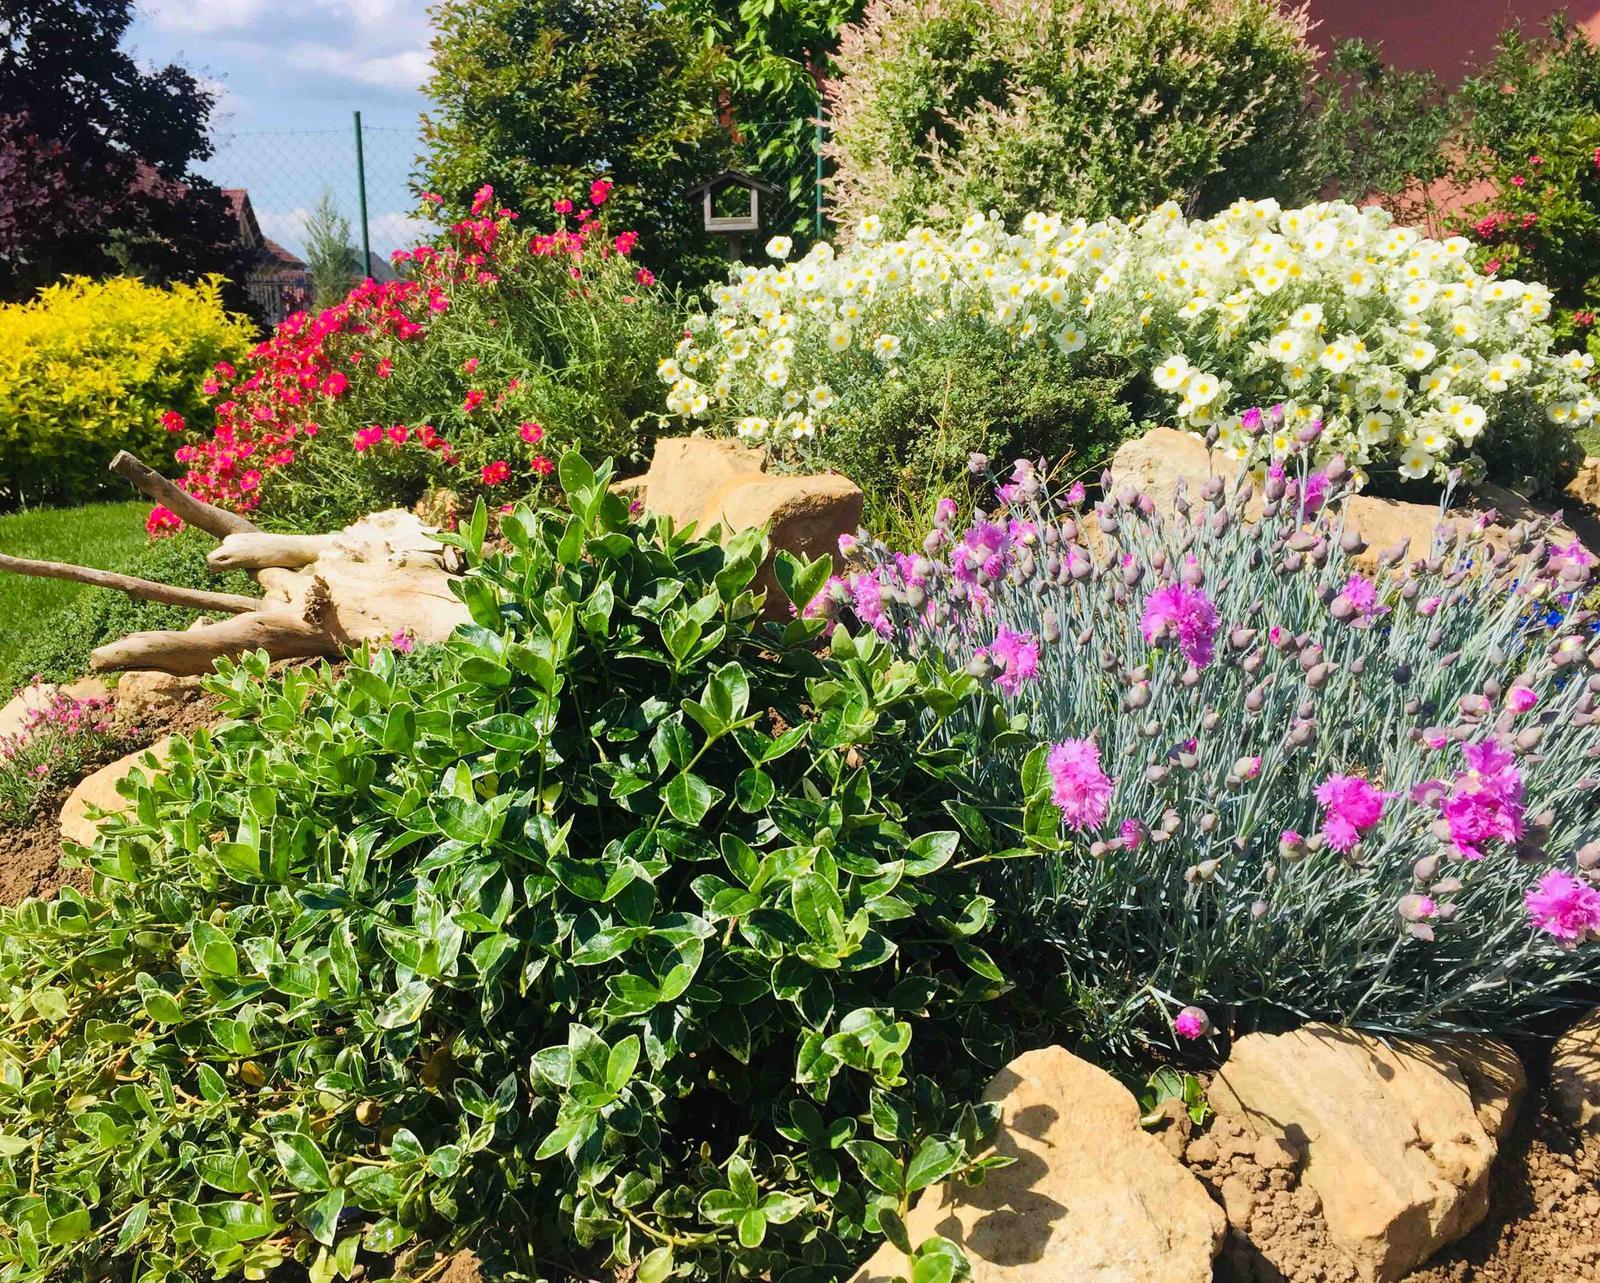 Naše barevná zahrada 🌸 - Na skalce to hraje všemi barvami 🌸